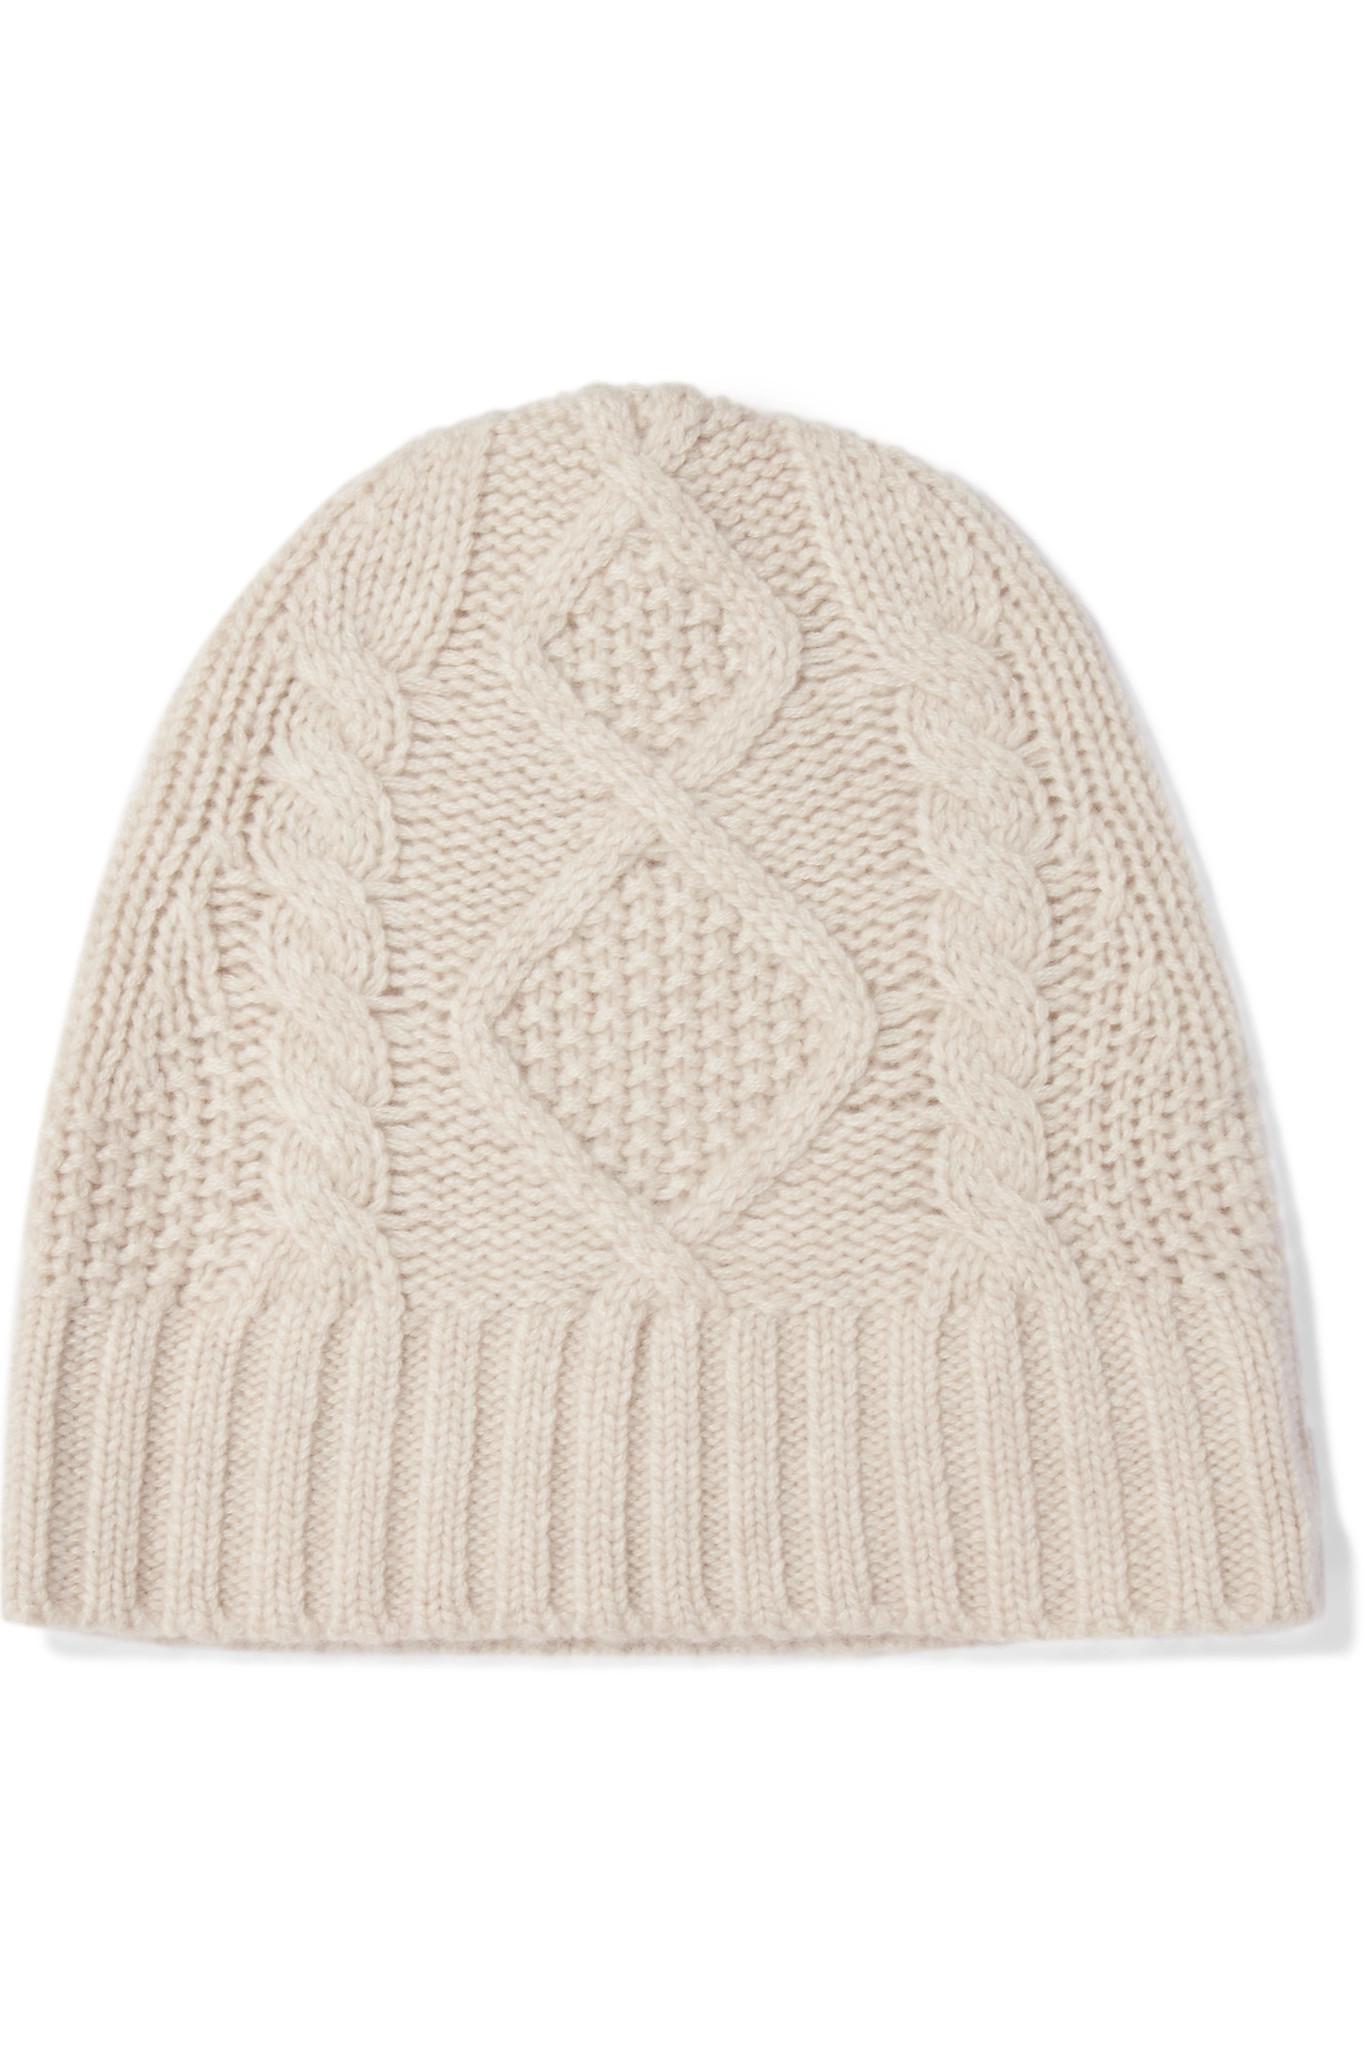 Cable-knit Wool And Cashmere-blend Beanie - Black Frame Denim zFPumFL5H